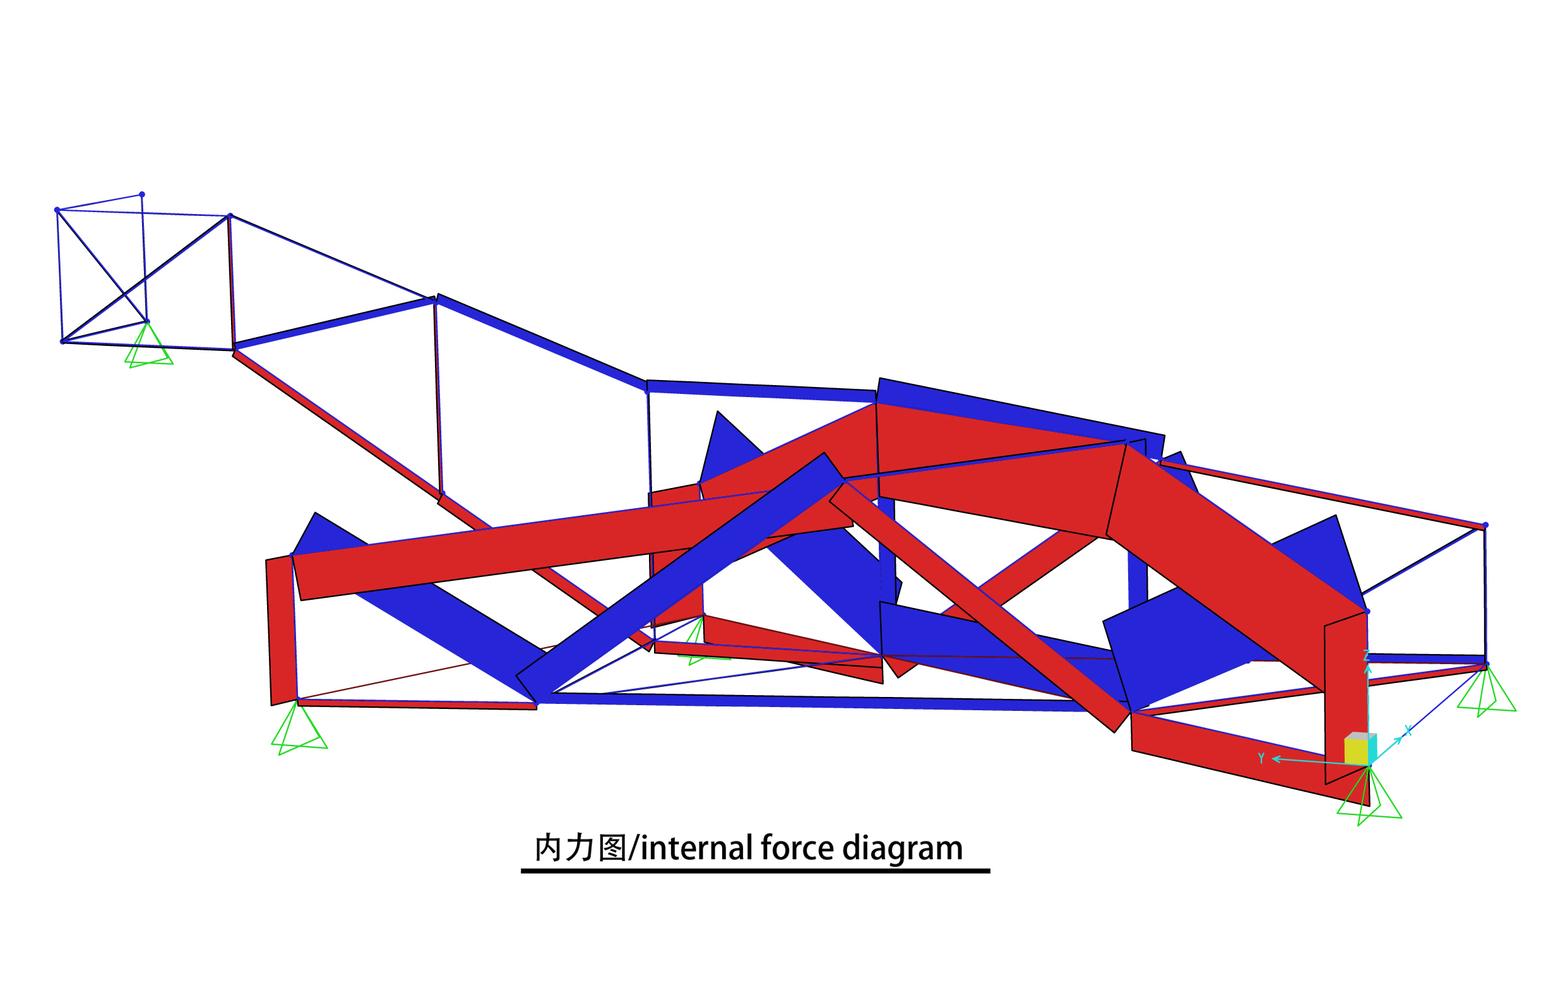 x bridge atelier groundwork architecture internal force diagram [ 1553 x 1000 Pixel ]